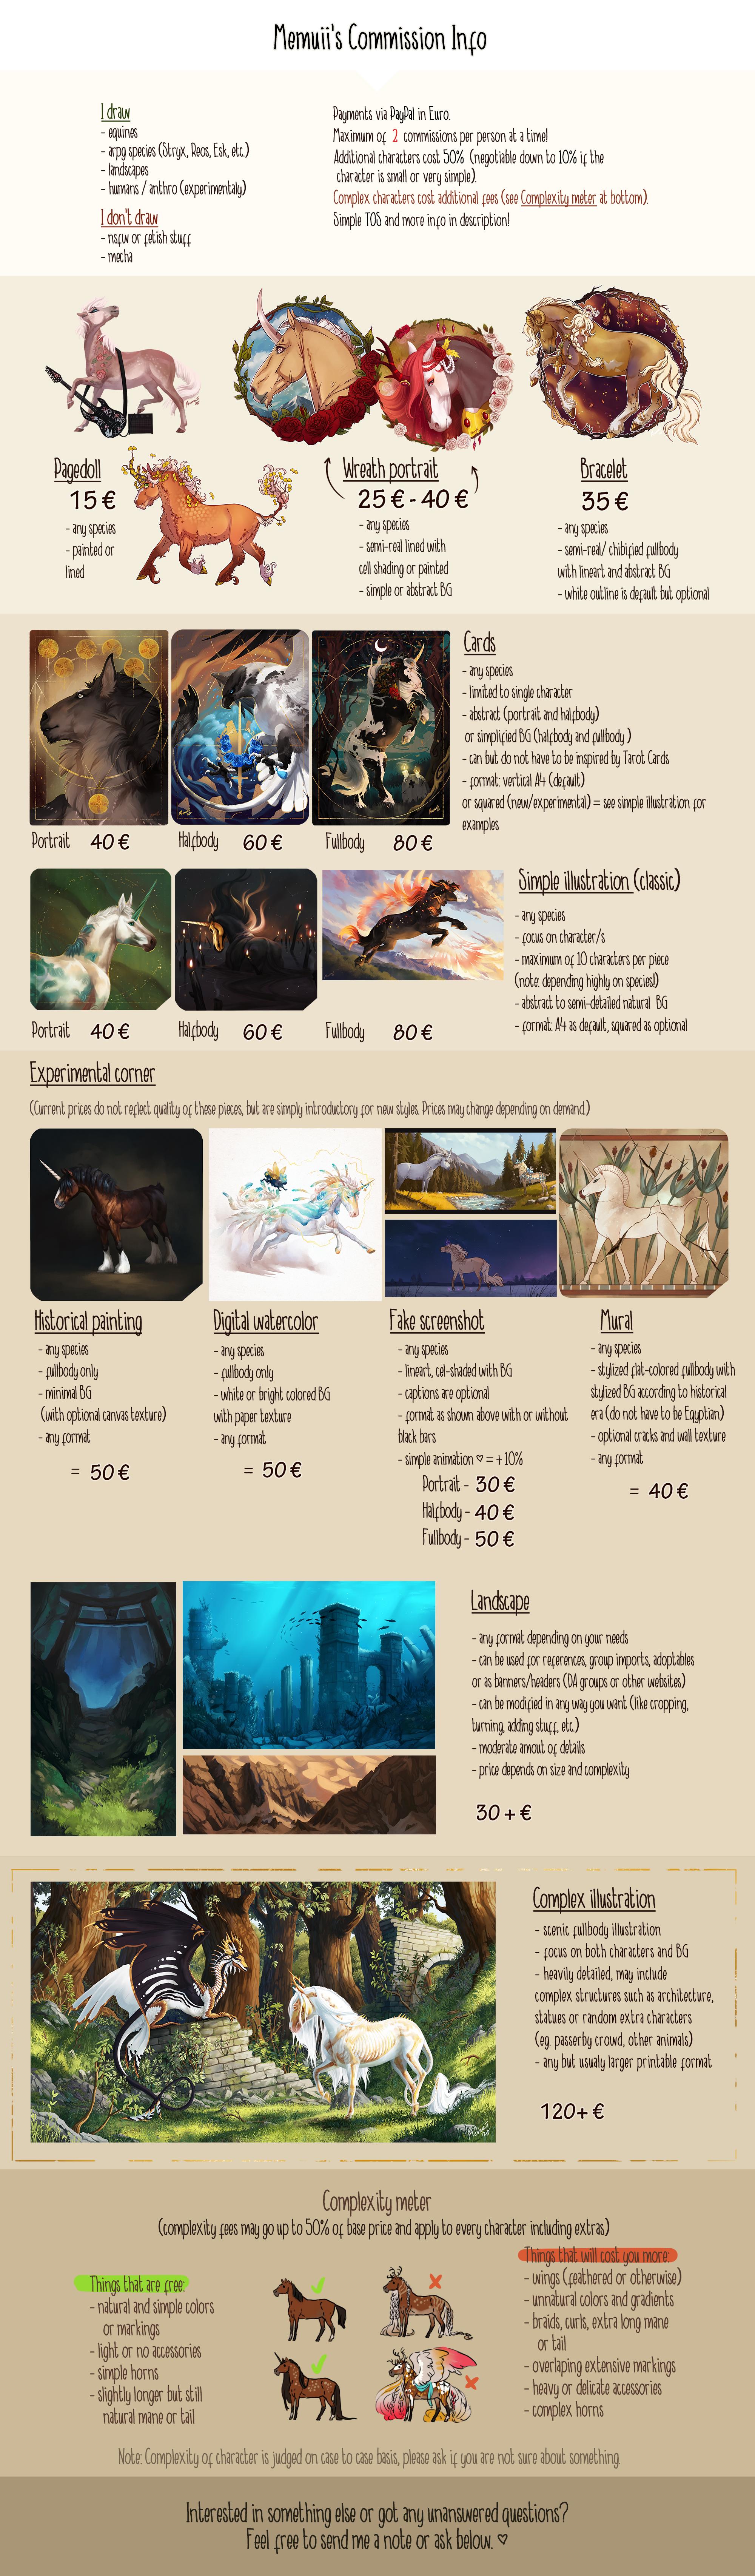 Memuii' Commissions Info - Semi-open!